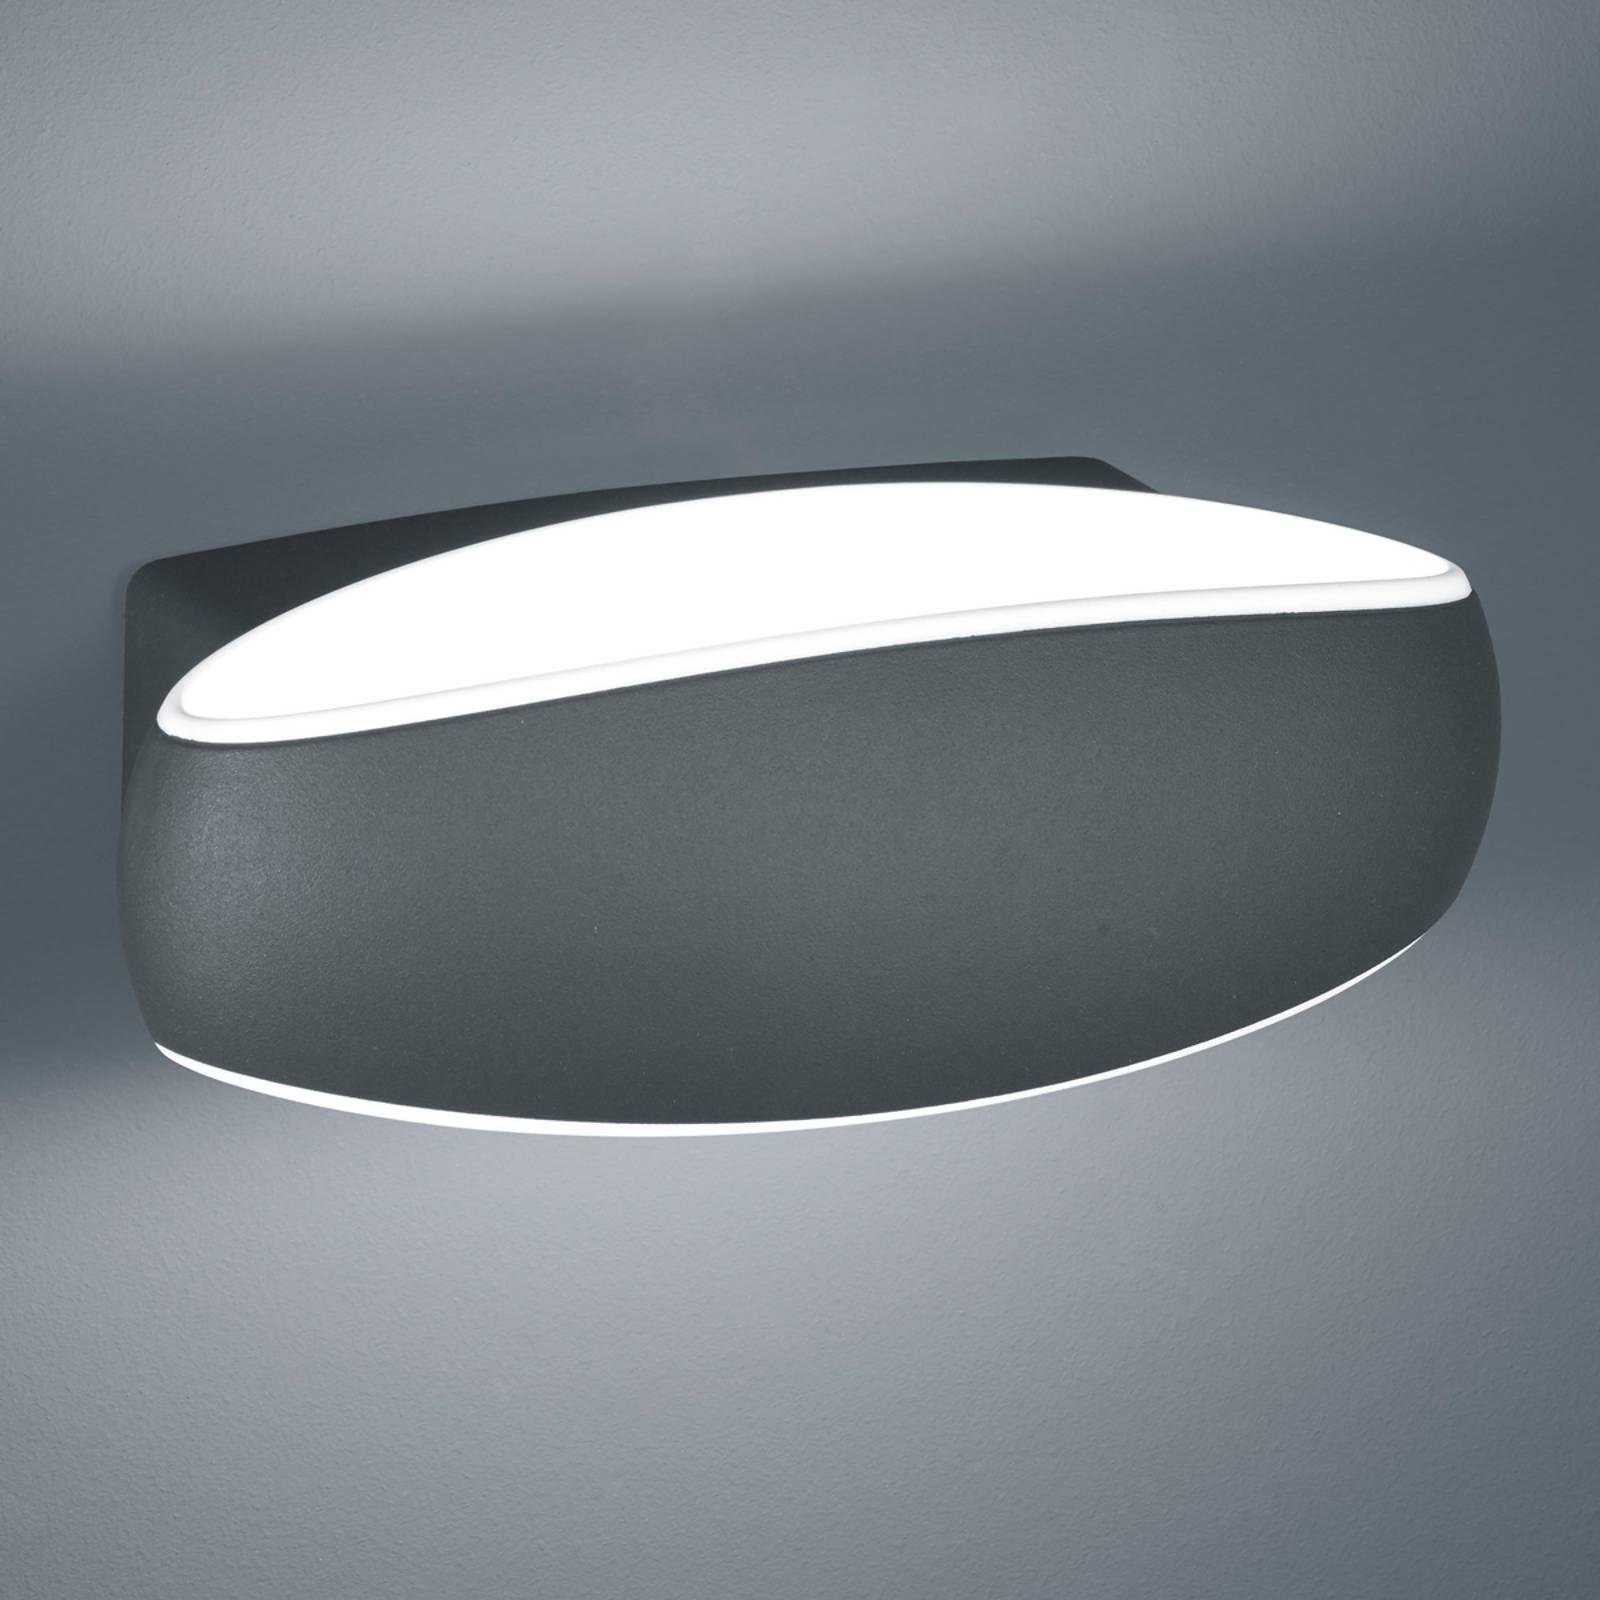 Helestra Sea - LED buitenwandlamp in ovale vorm